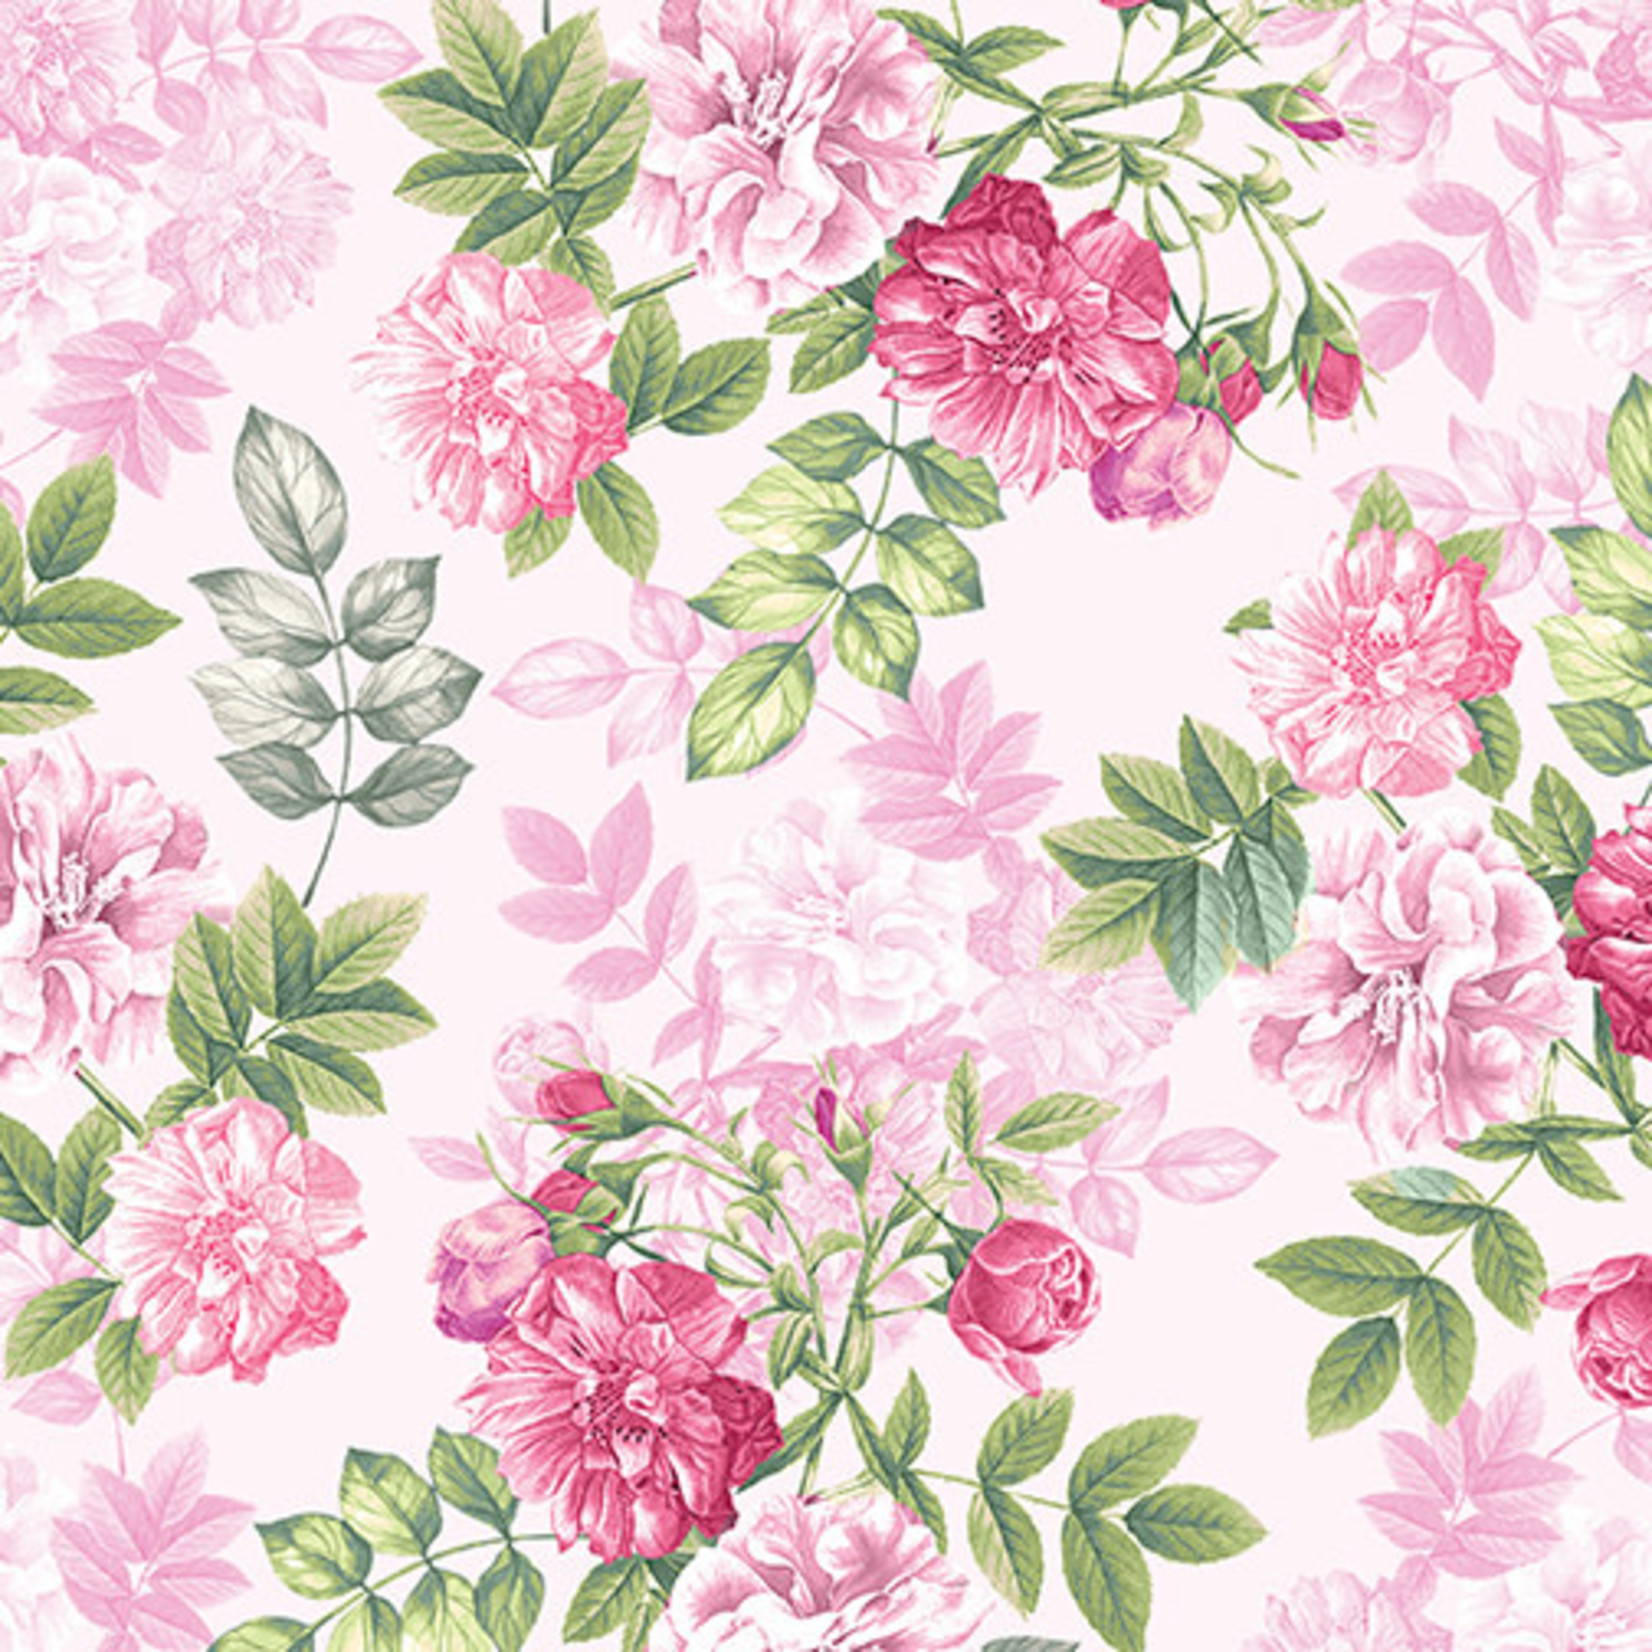 Contempo Studio Floral - Romance - Pink